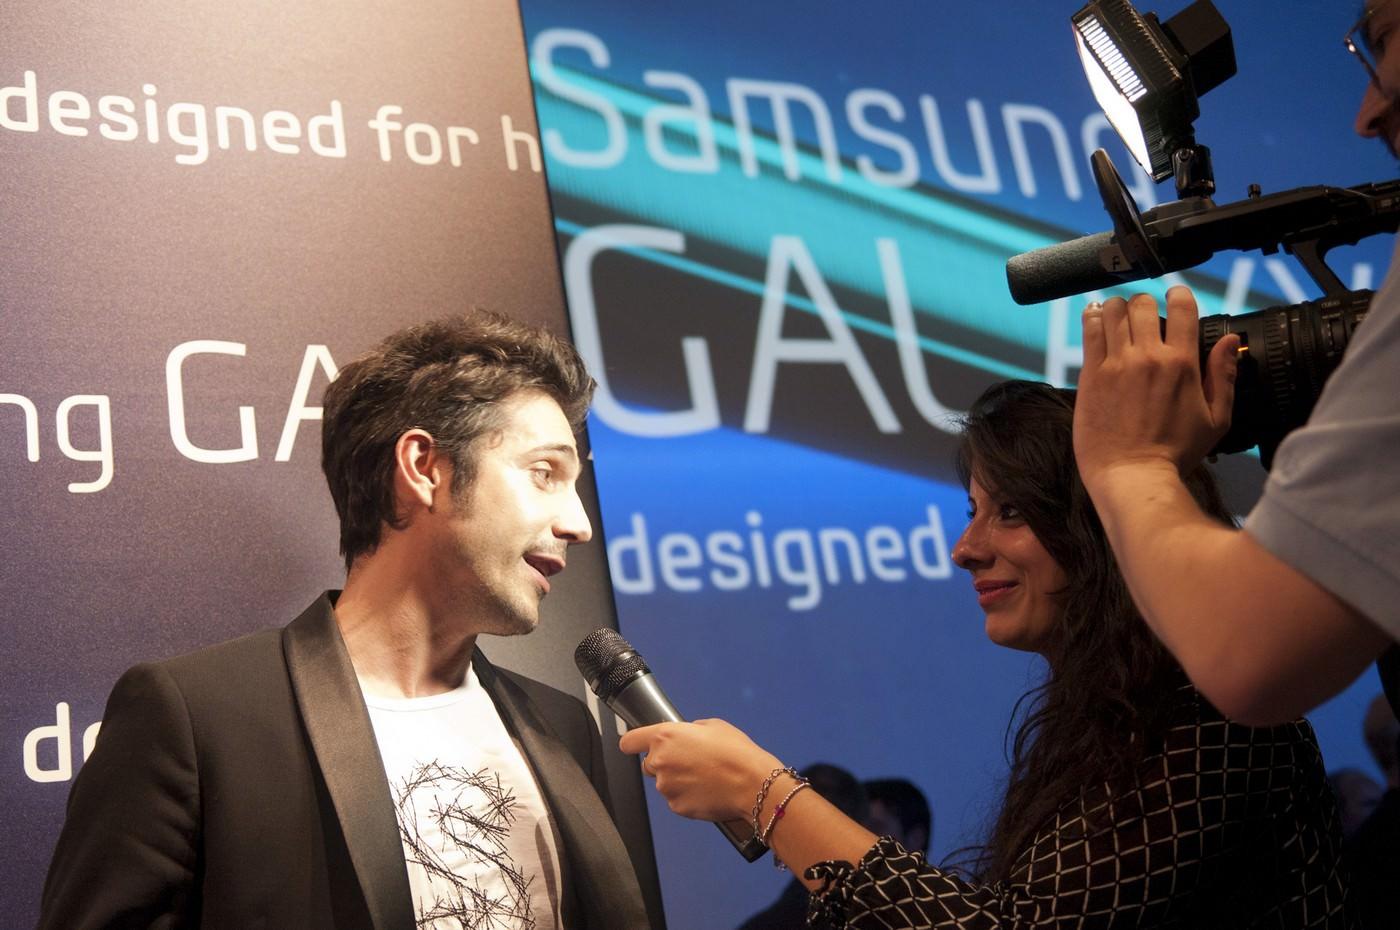 SamsungS339